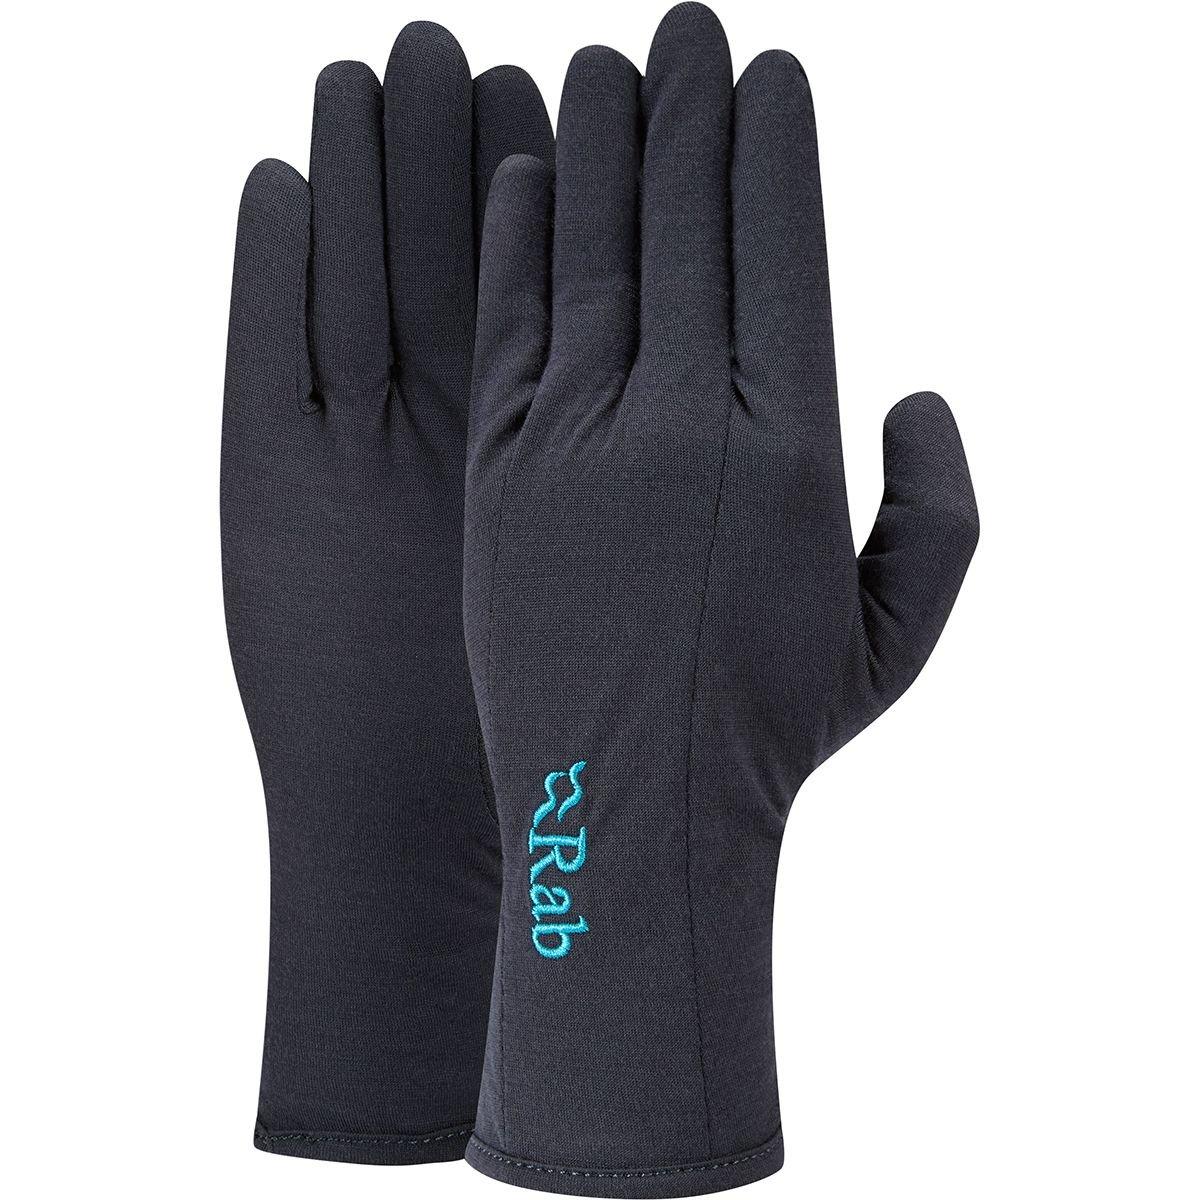 RAB Damen Merino 160 Handschuhe QAG-32-EB